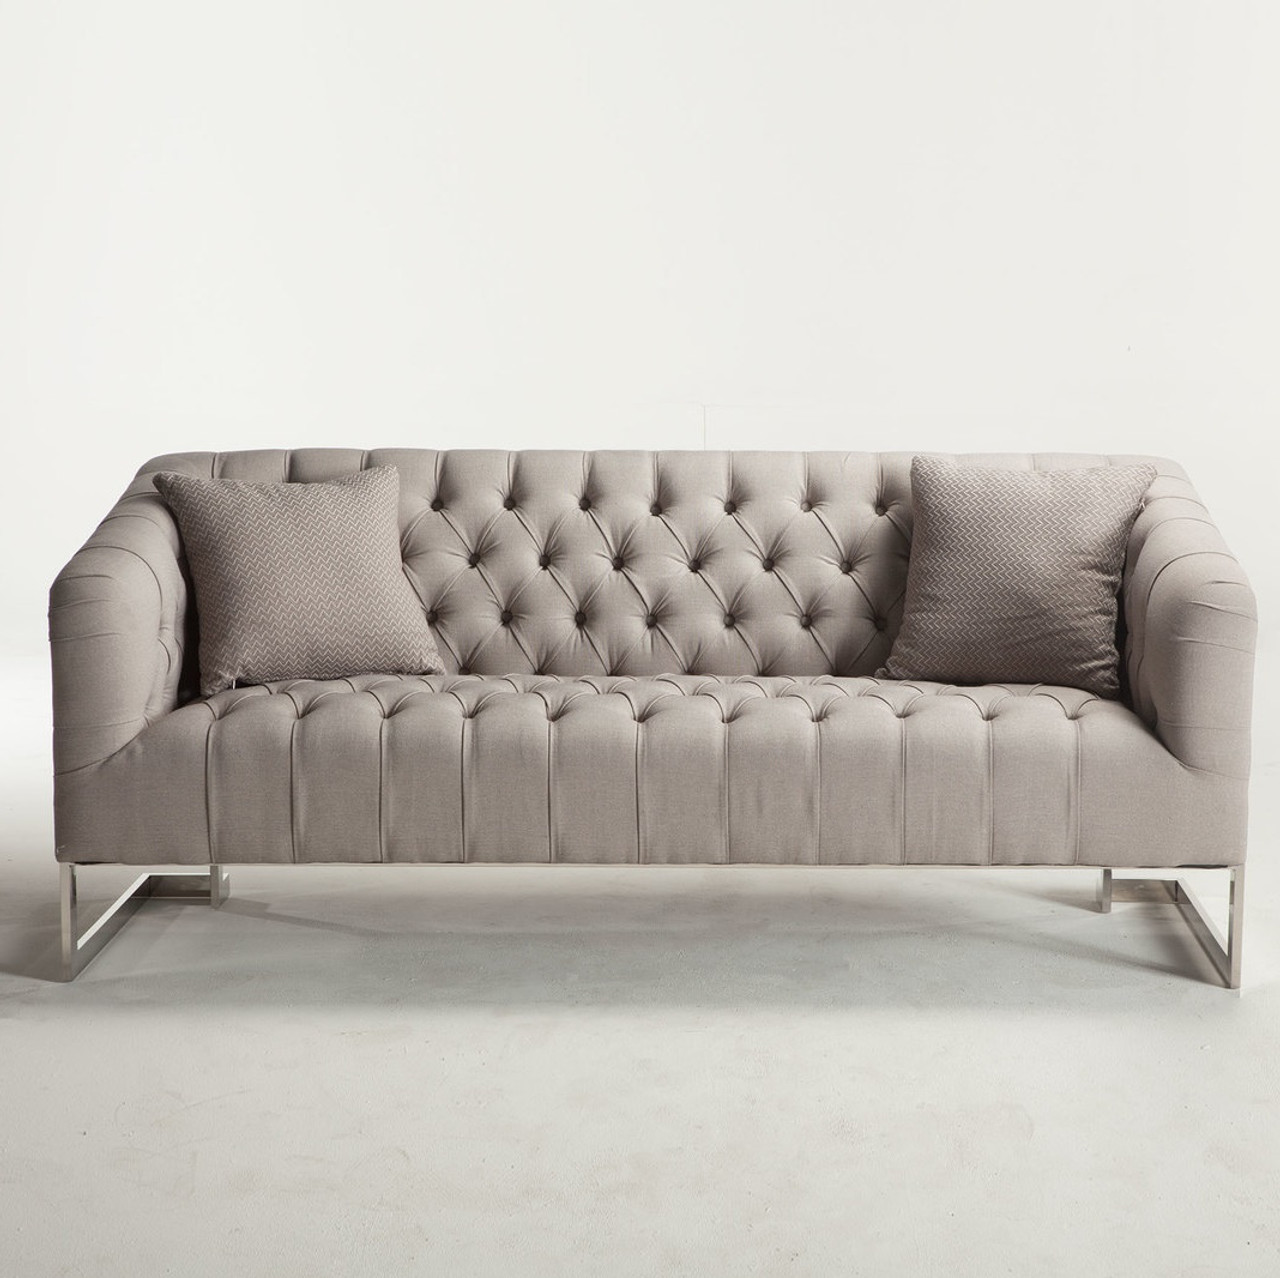 Austin Modern Tufted Sofa Grey Zin Home